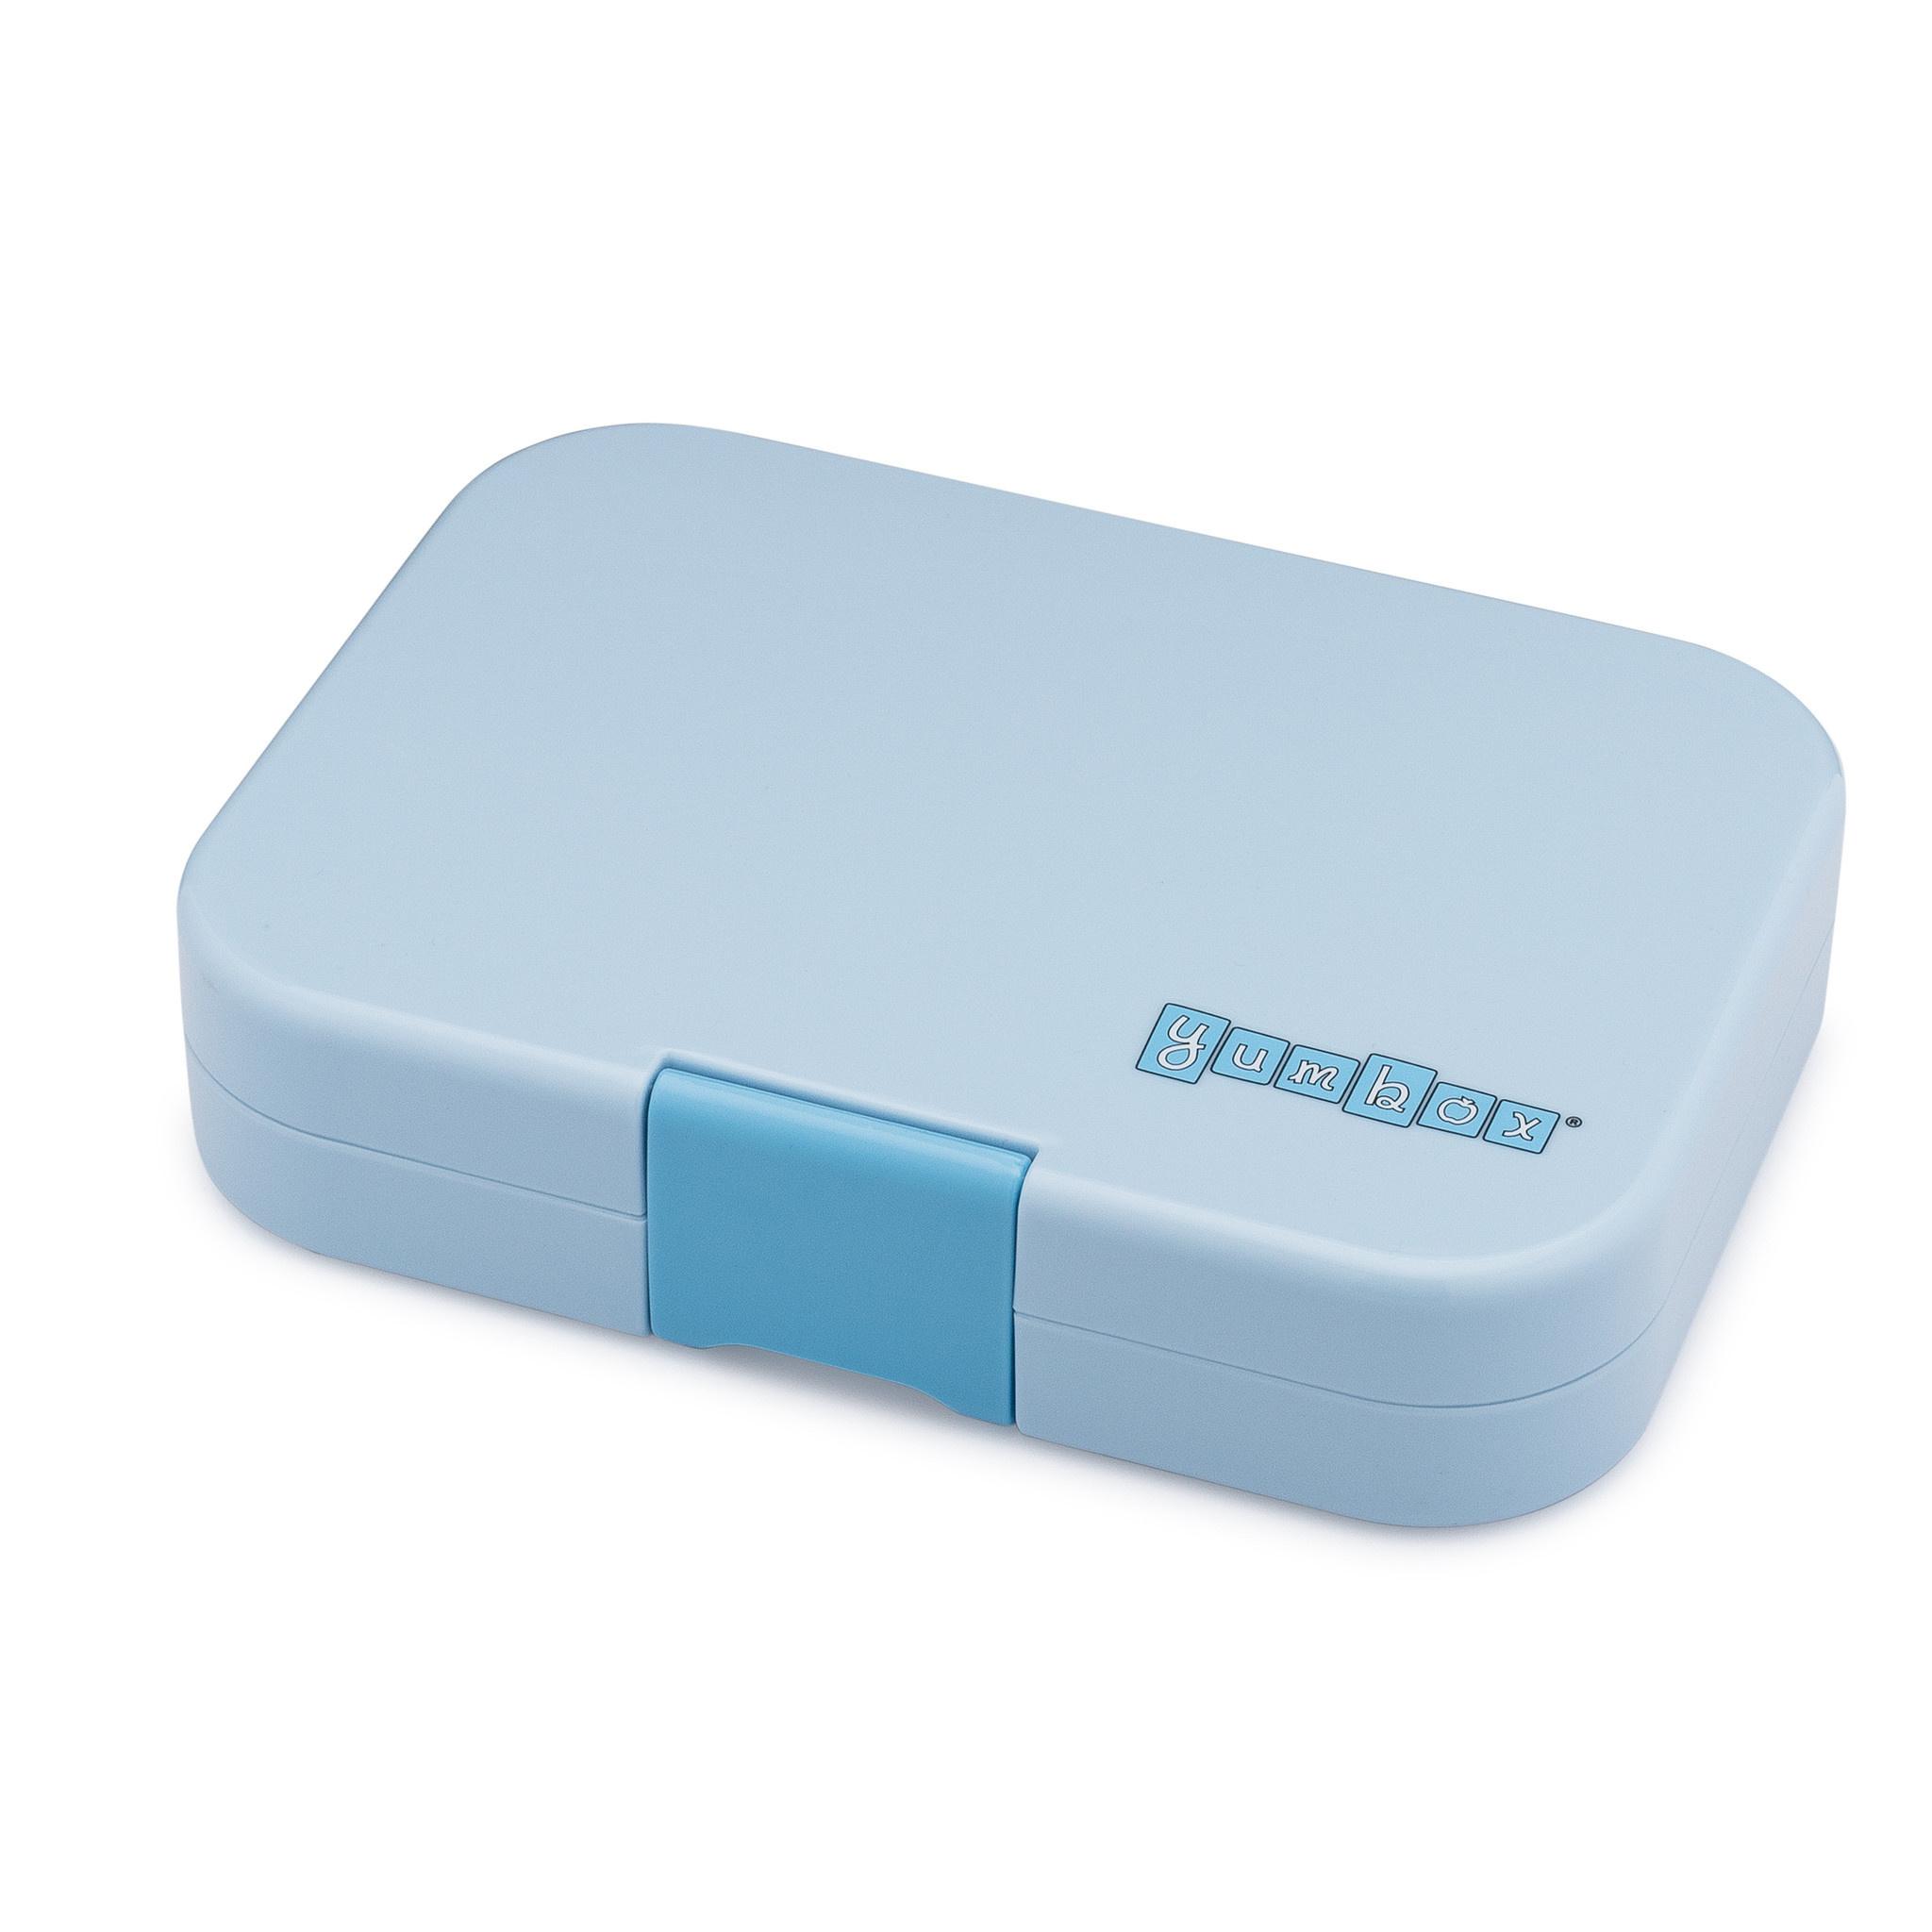 Yumbox exterior box Original Luna blauw-1